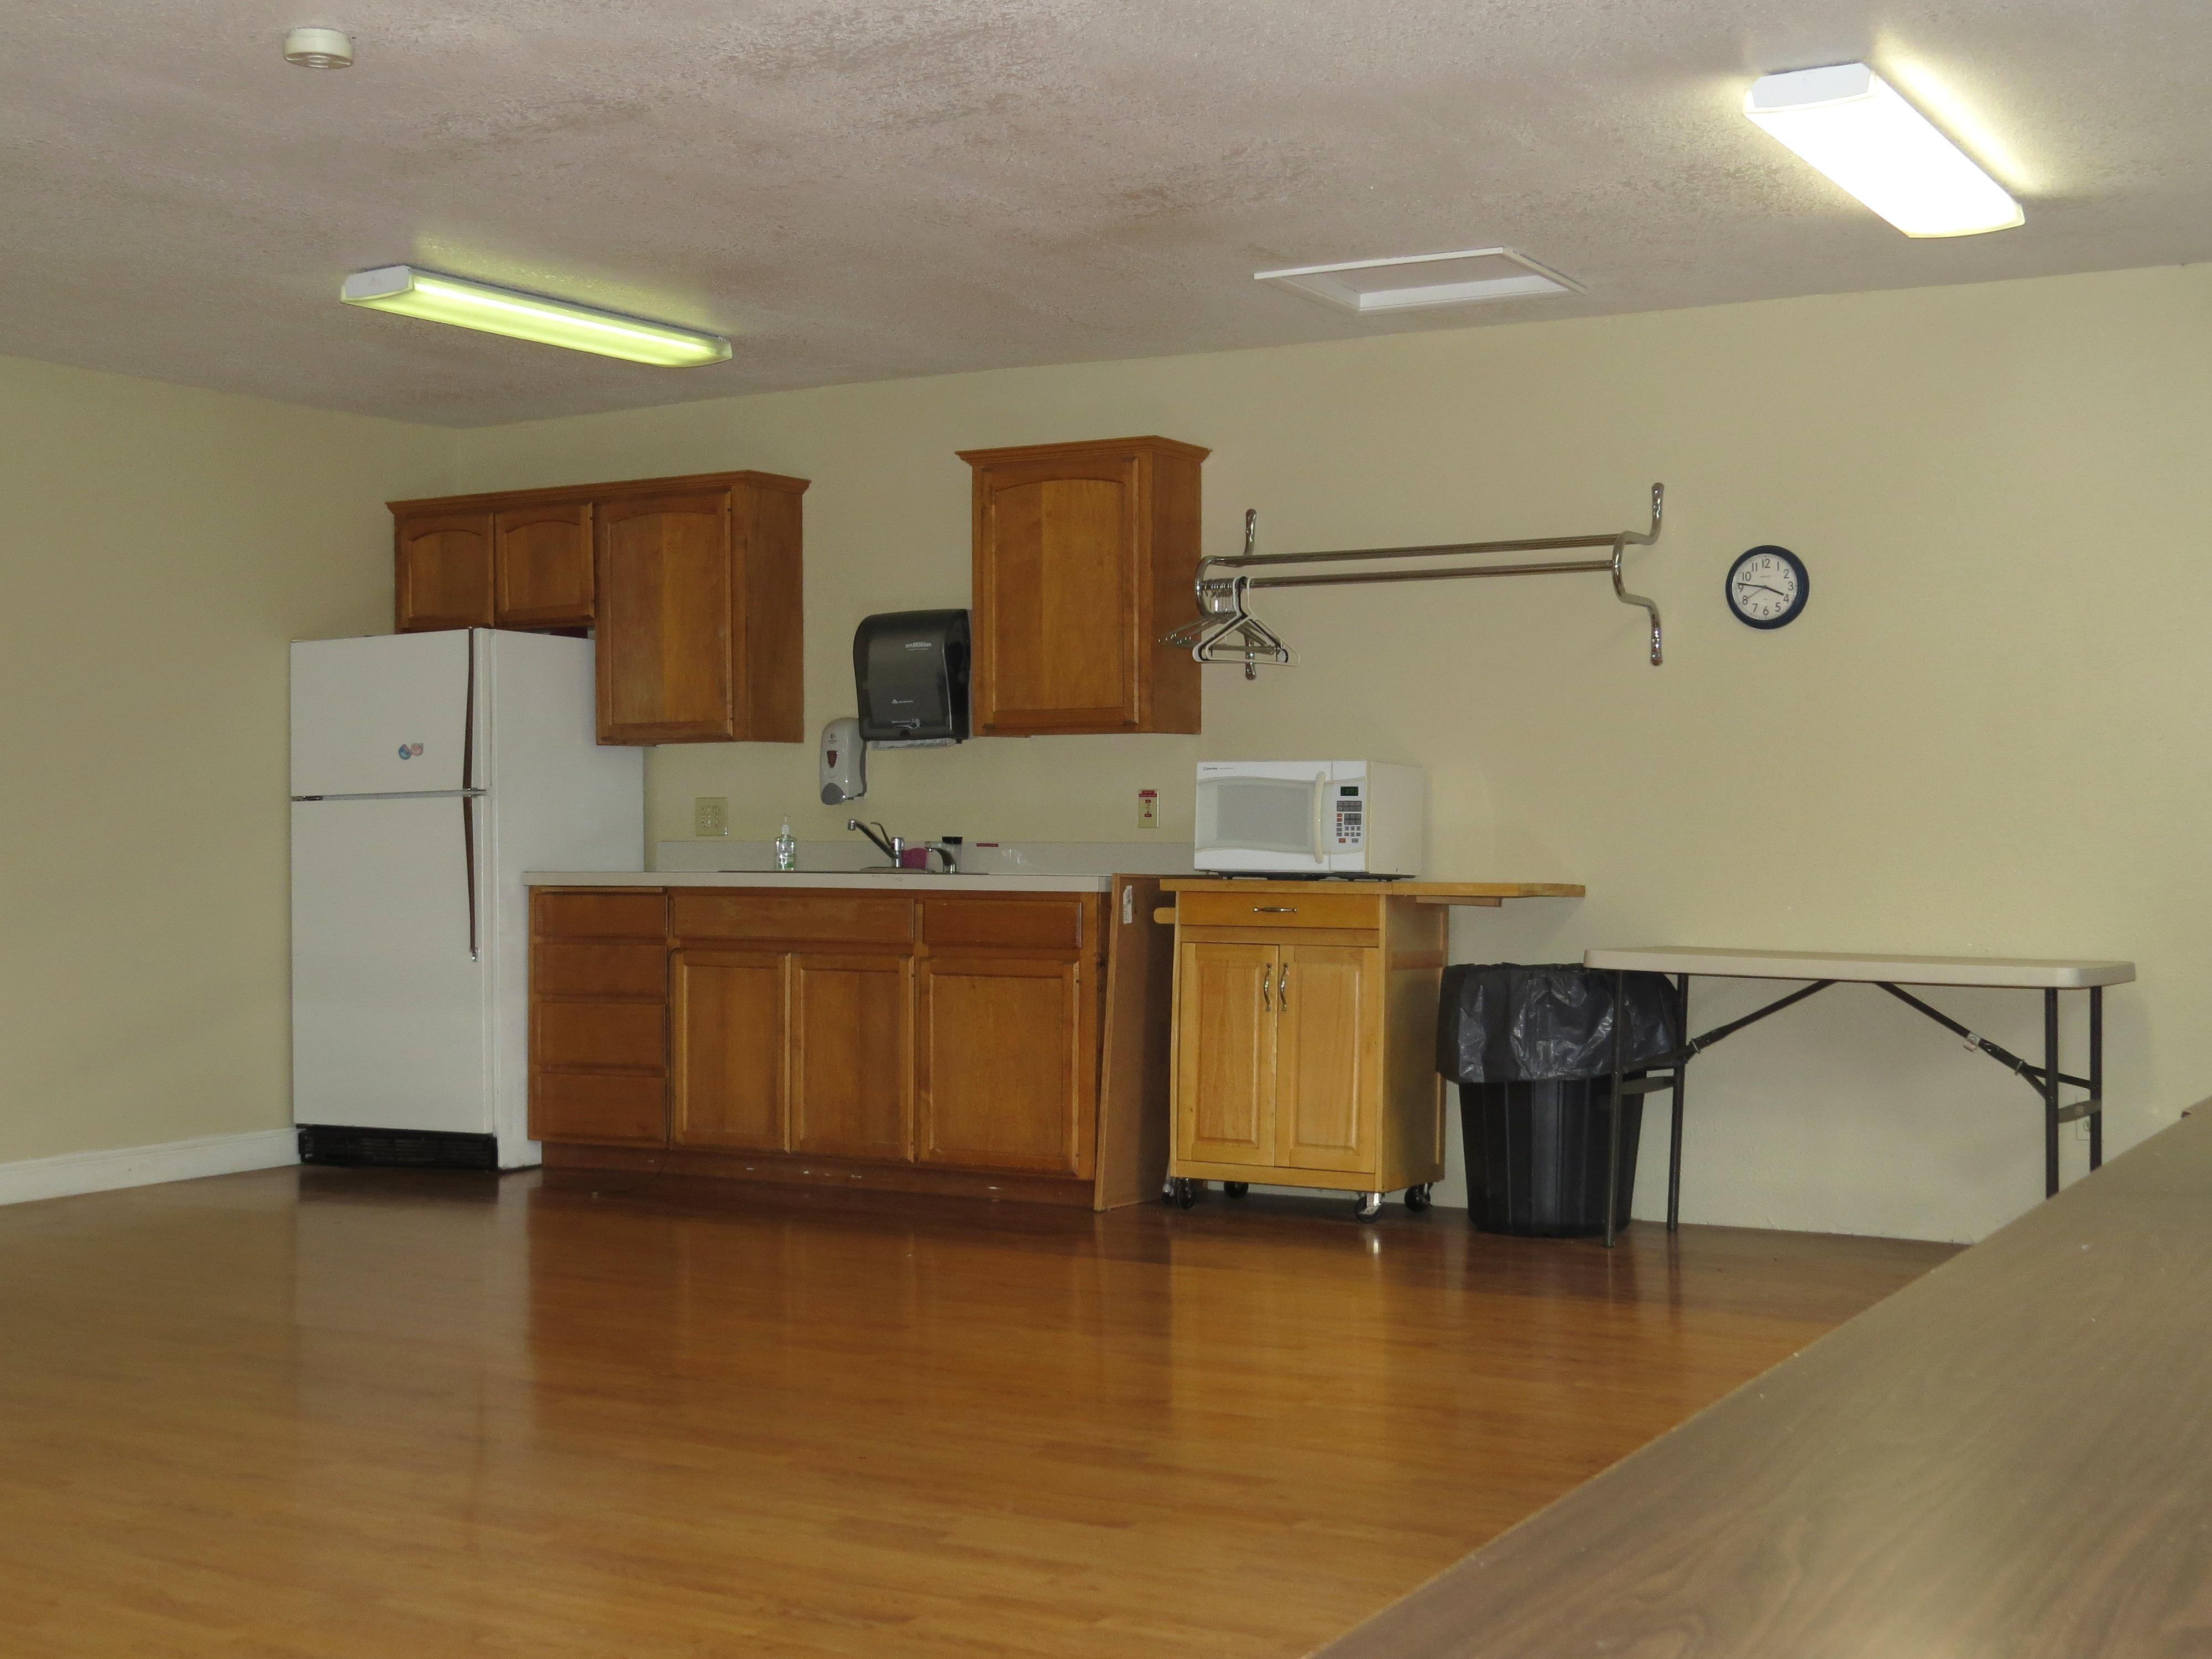 ashland-half-kitchen